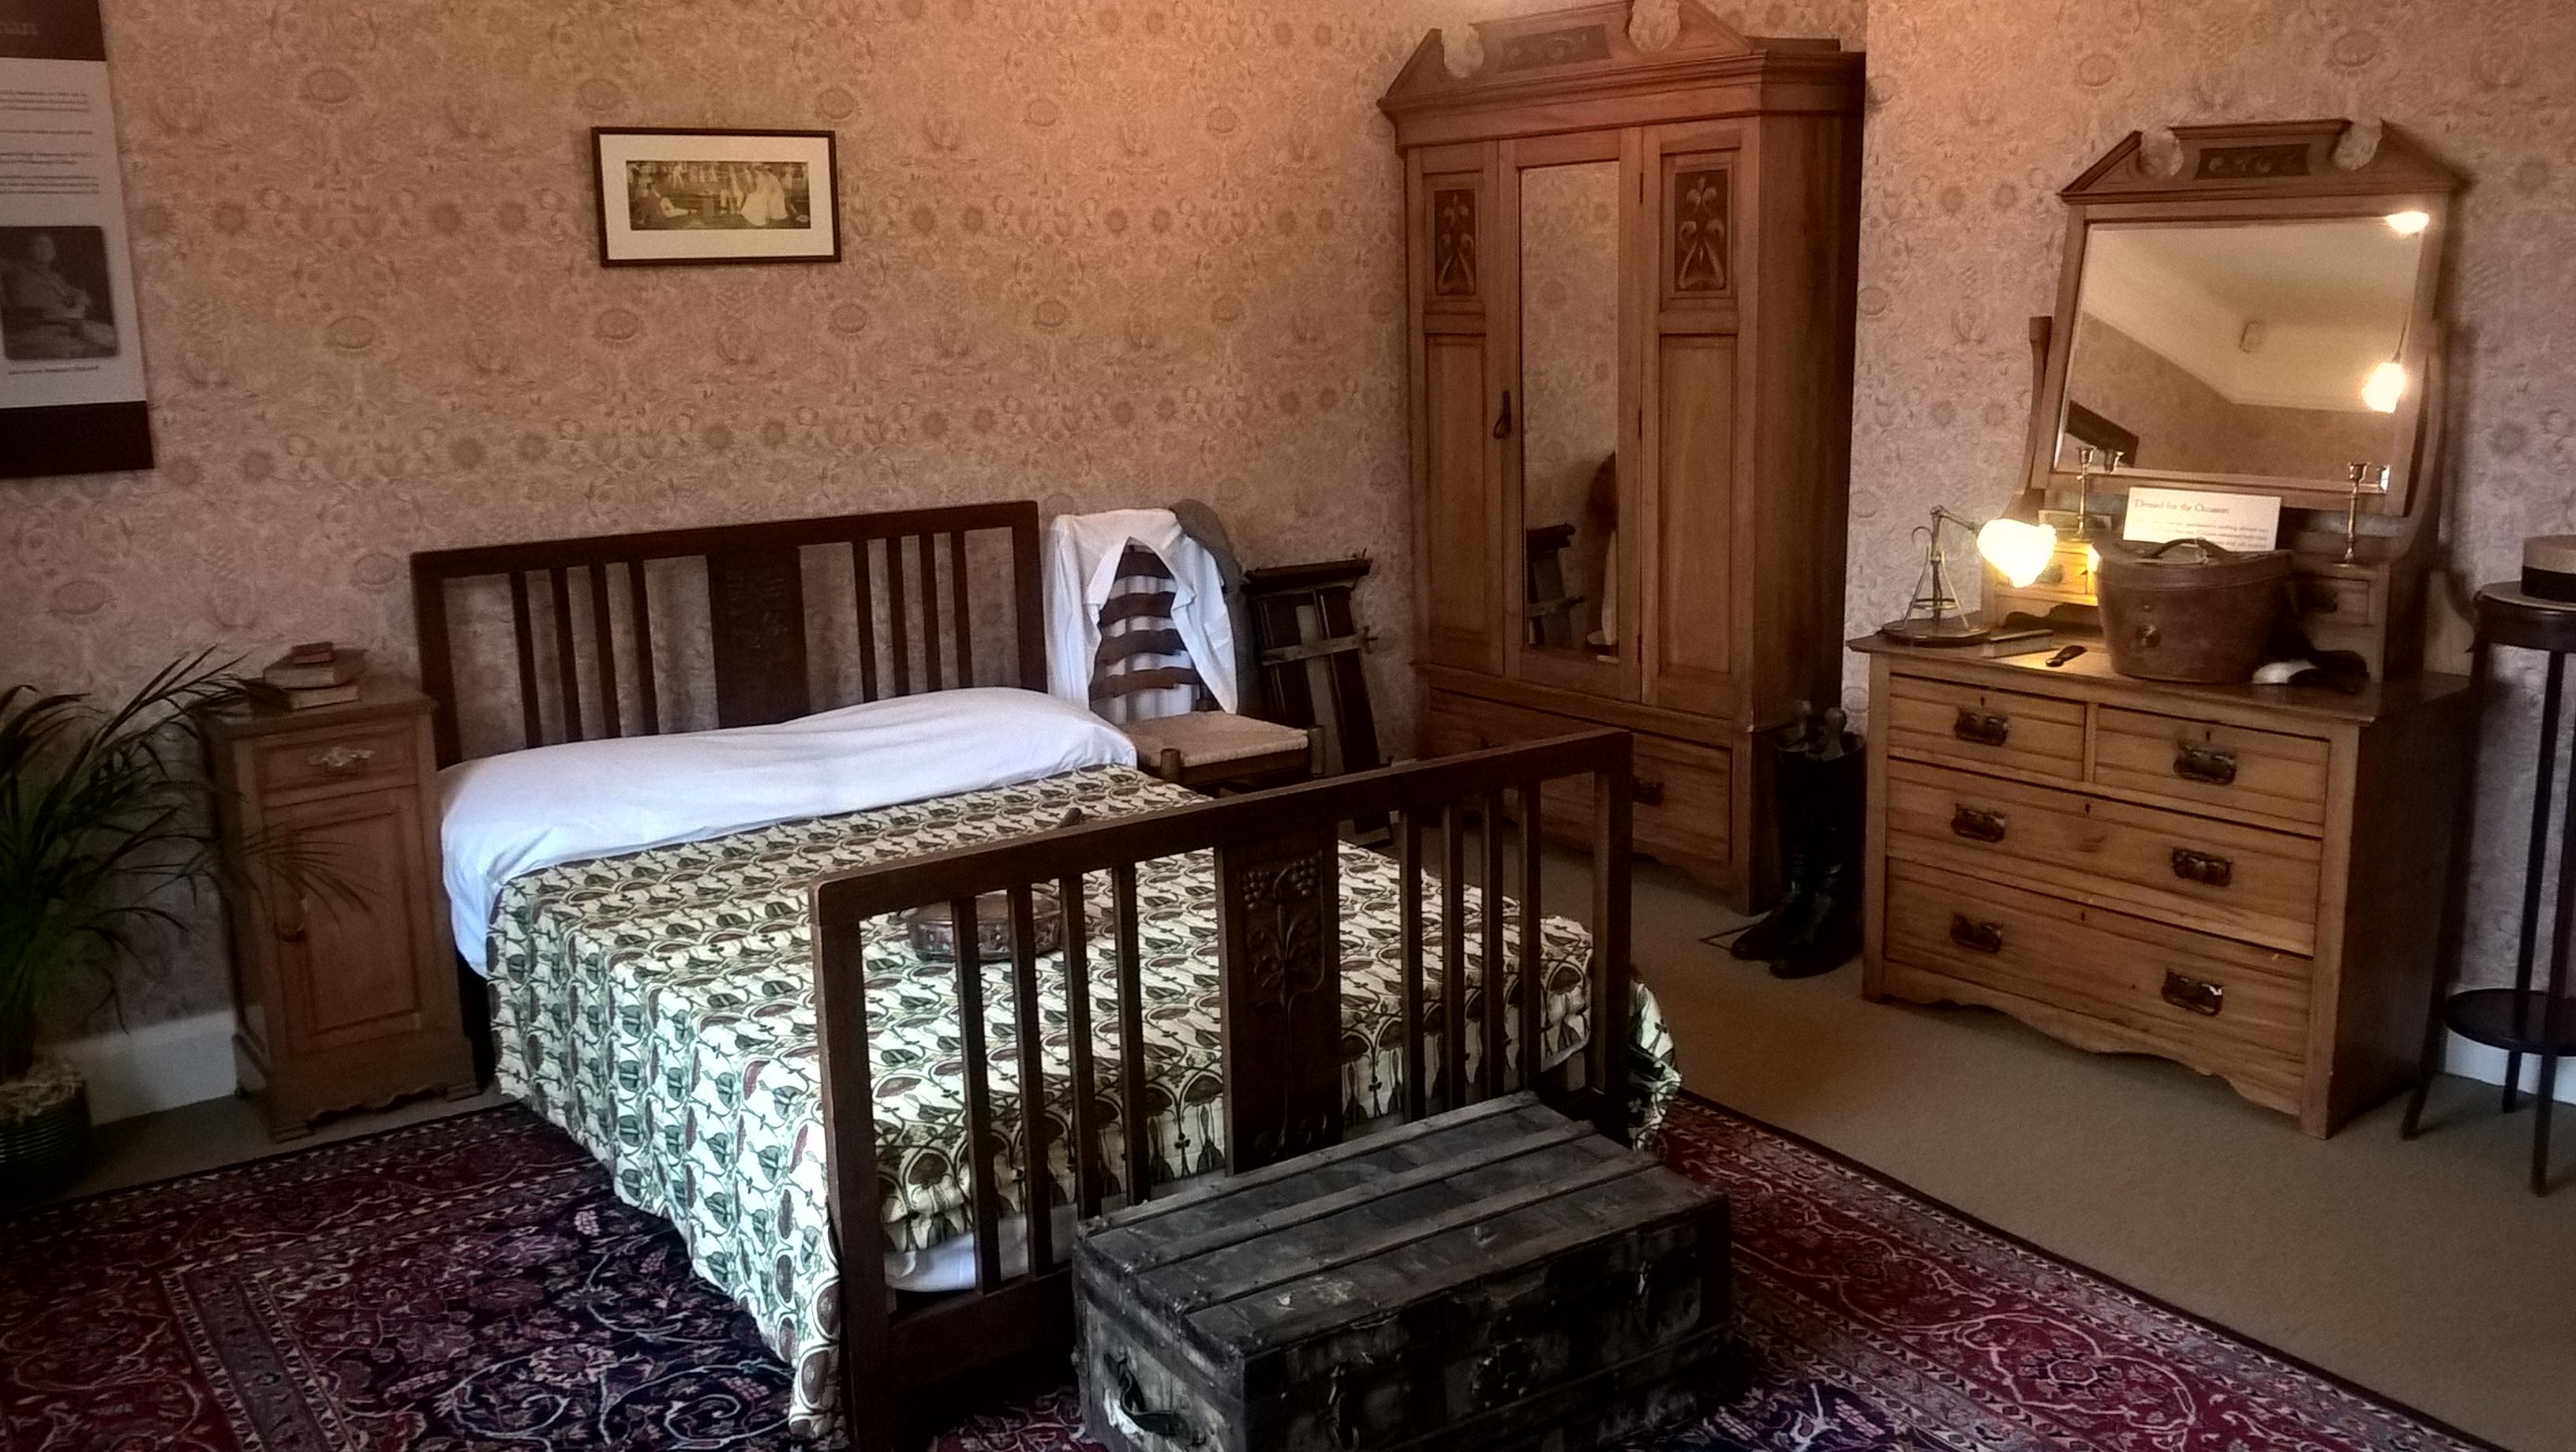 Image result for mirror in bedroom,nari